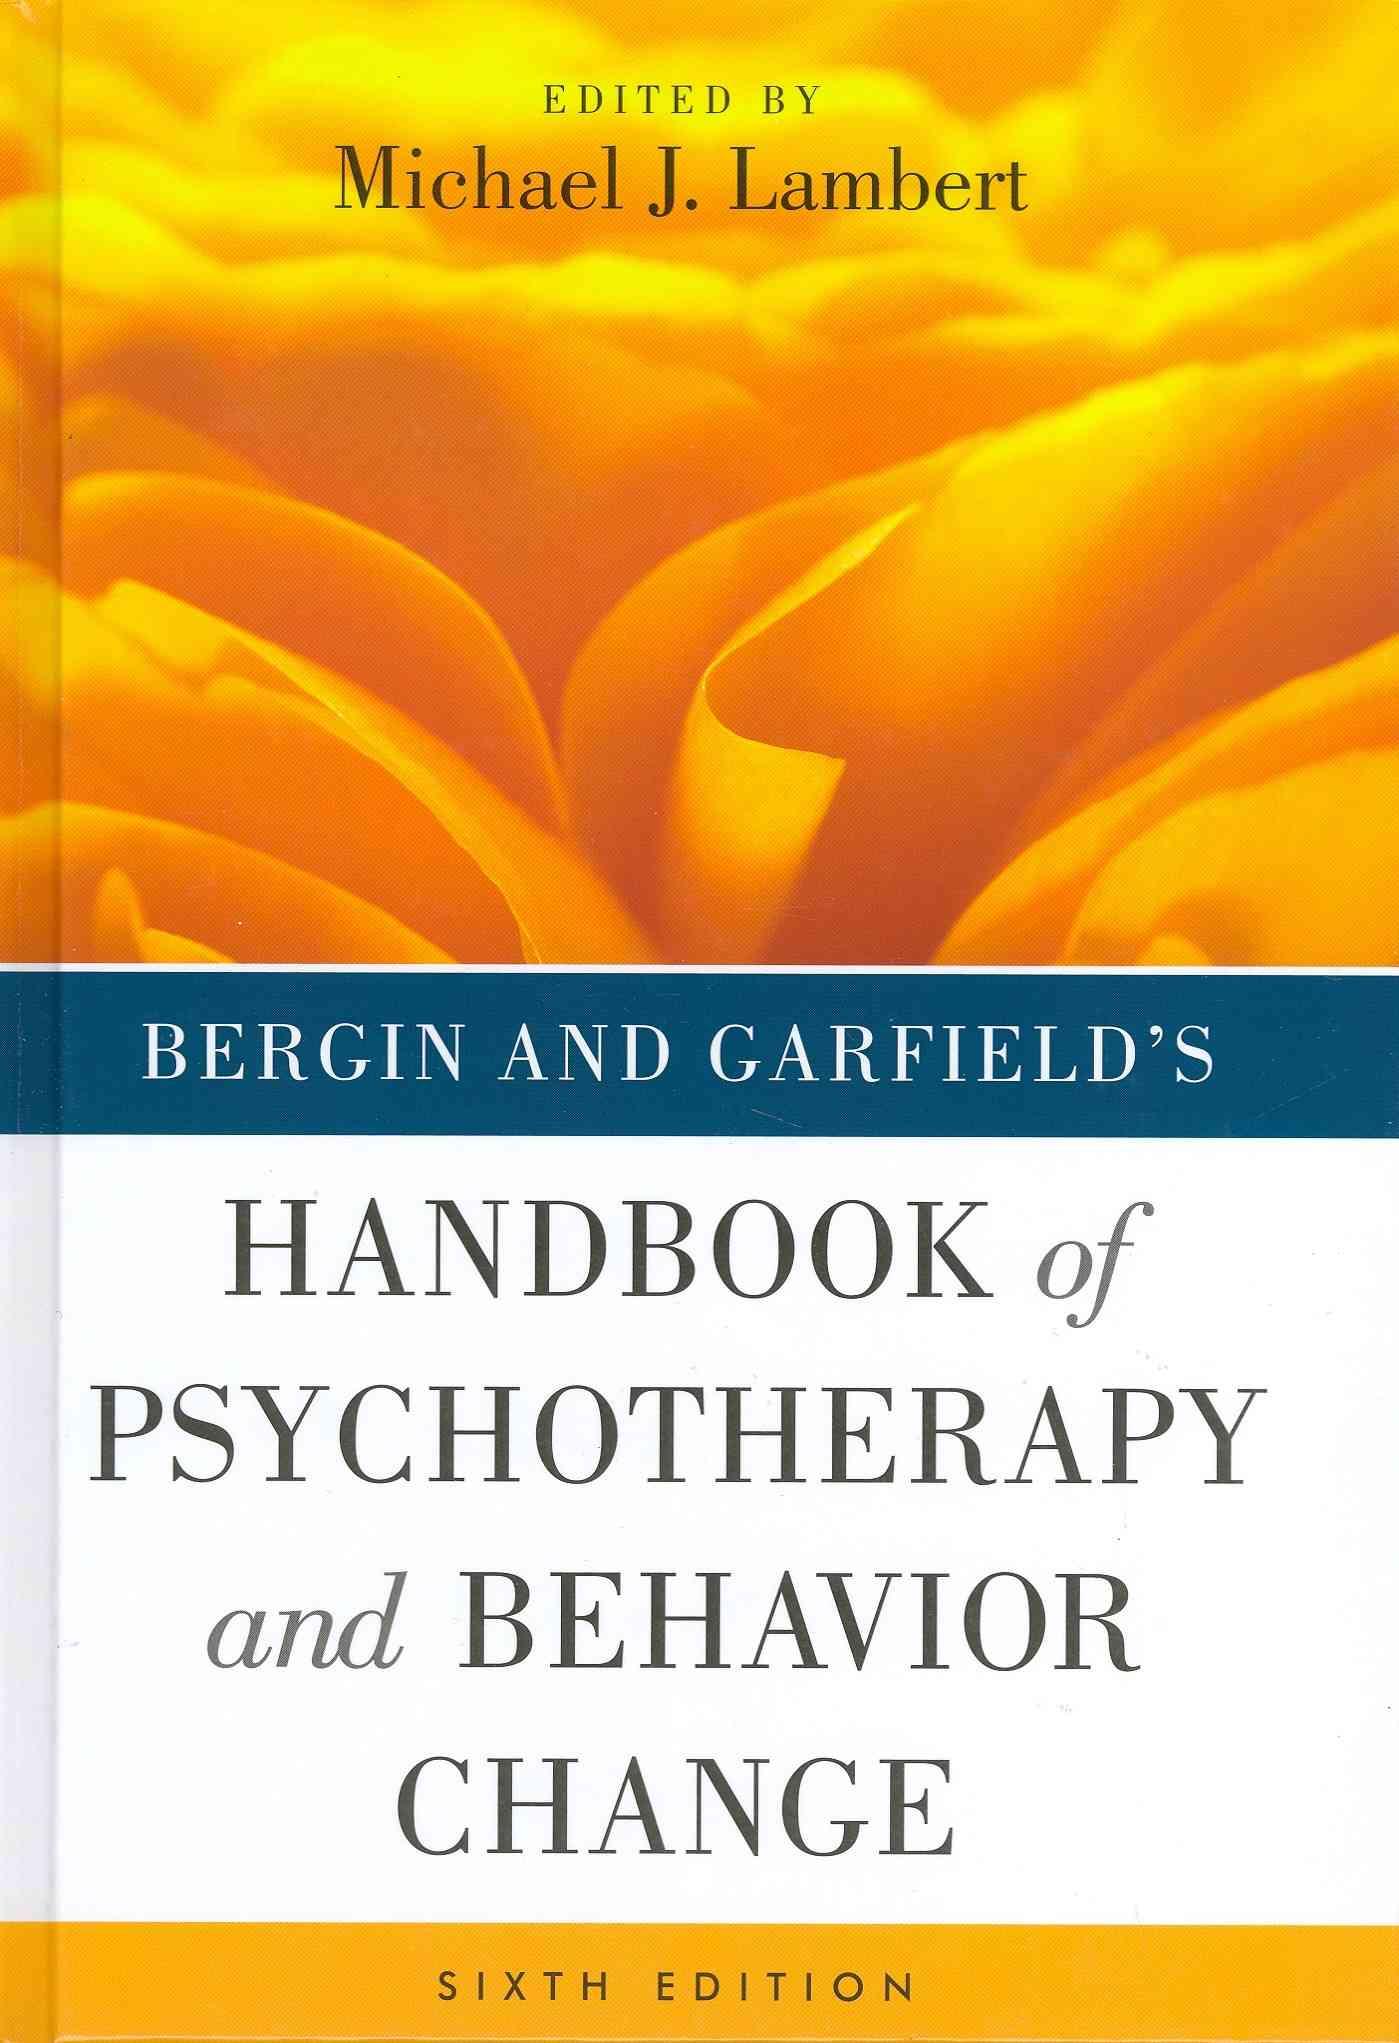 Bergin and Garfield's Handbook of Psychotherapy and Behavior Change By Lambert, Michael J.